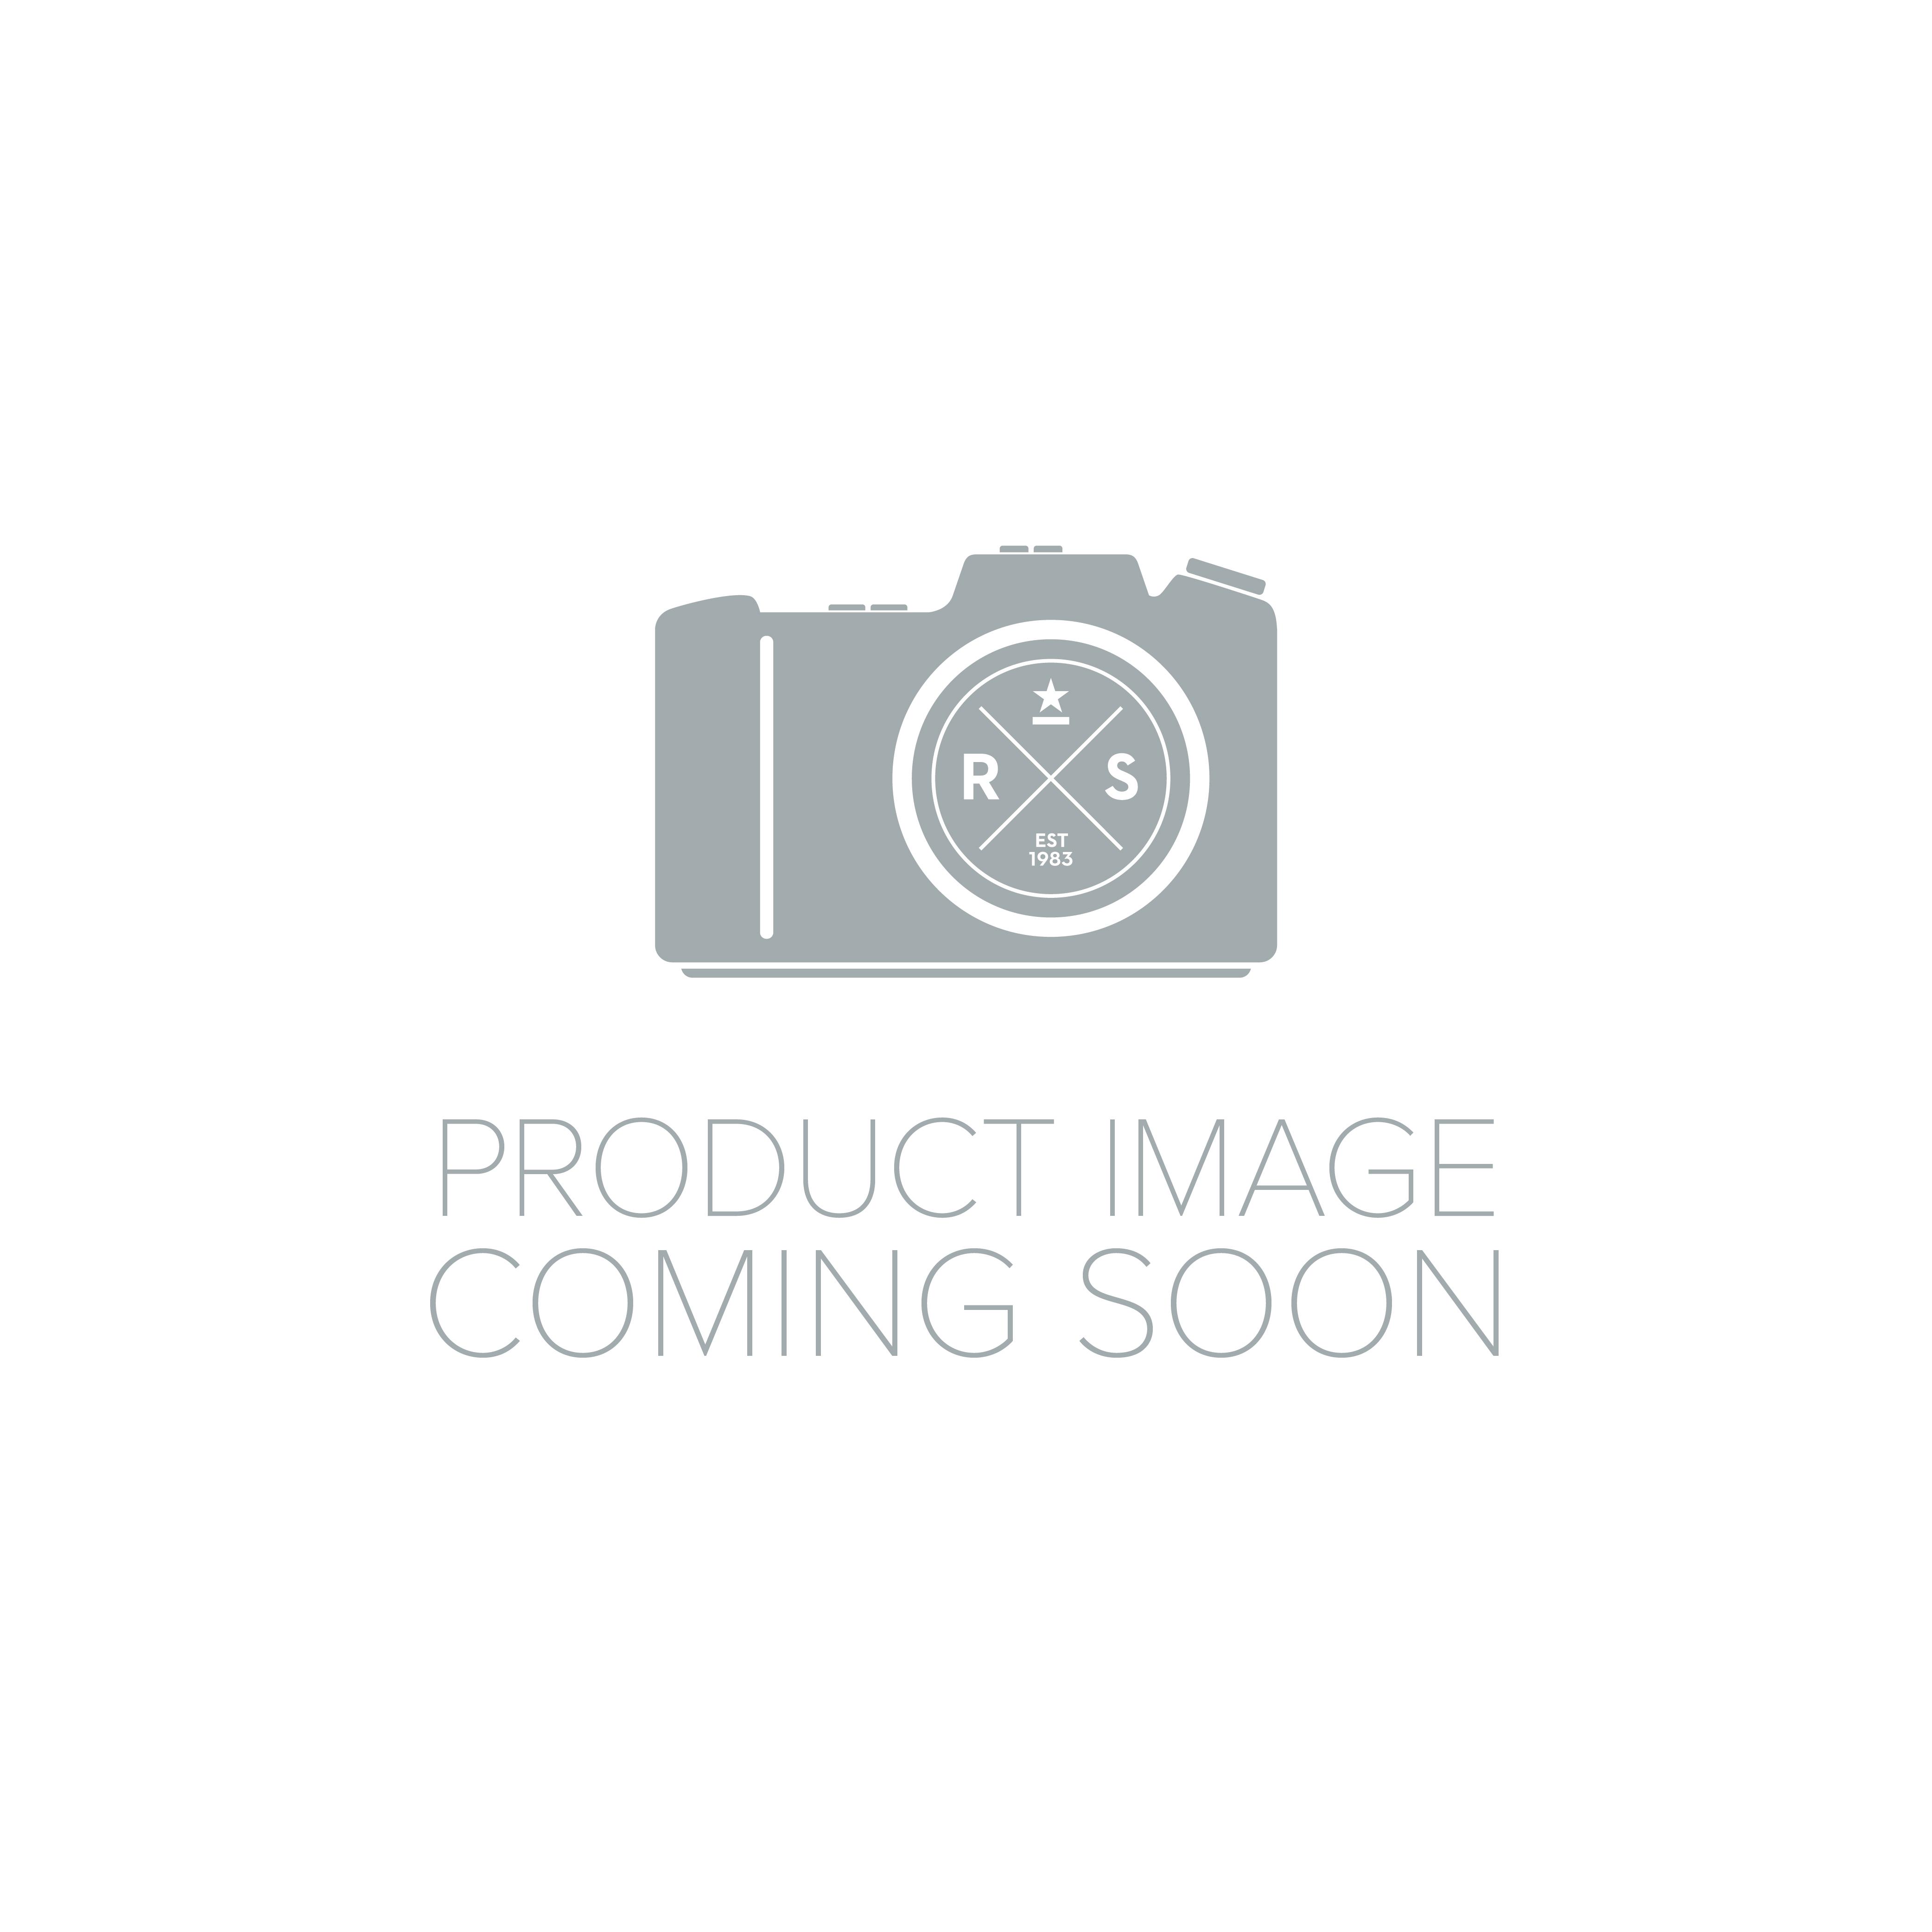 Sylvania - 75105 - LED/ADAPTOR/GU24